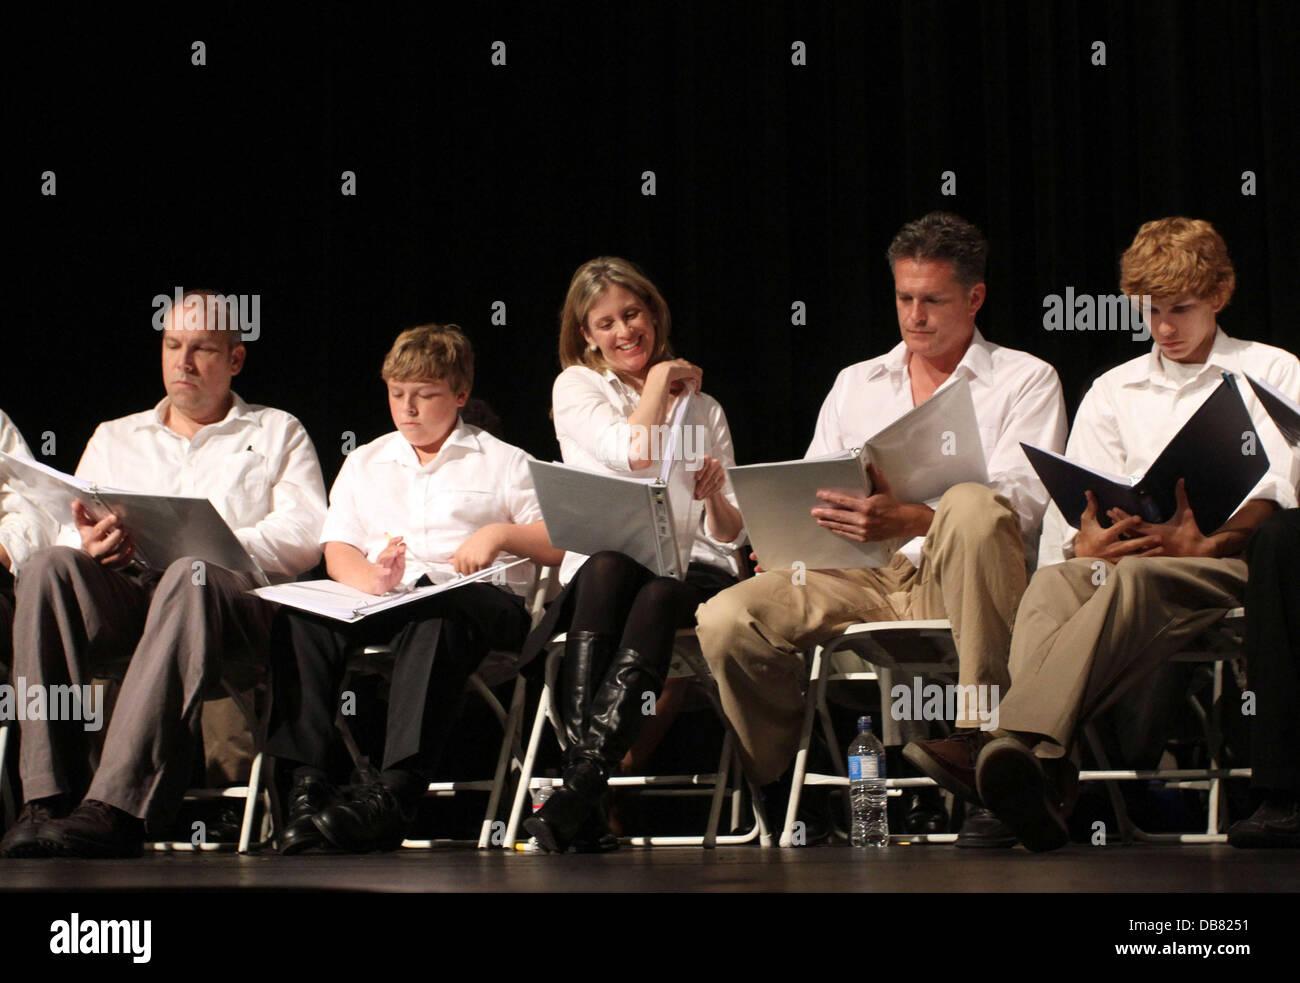 Robert Watzke, Zane Amundsen, Helen Slater, David Humphrey and Tyler Voss 'The Road To Freedom' live audience - Stock Image